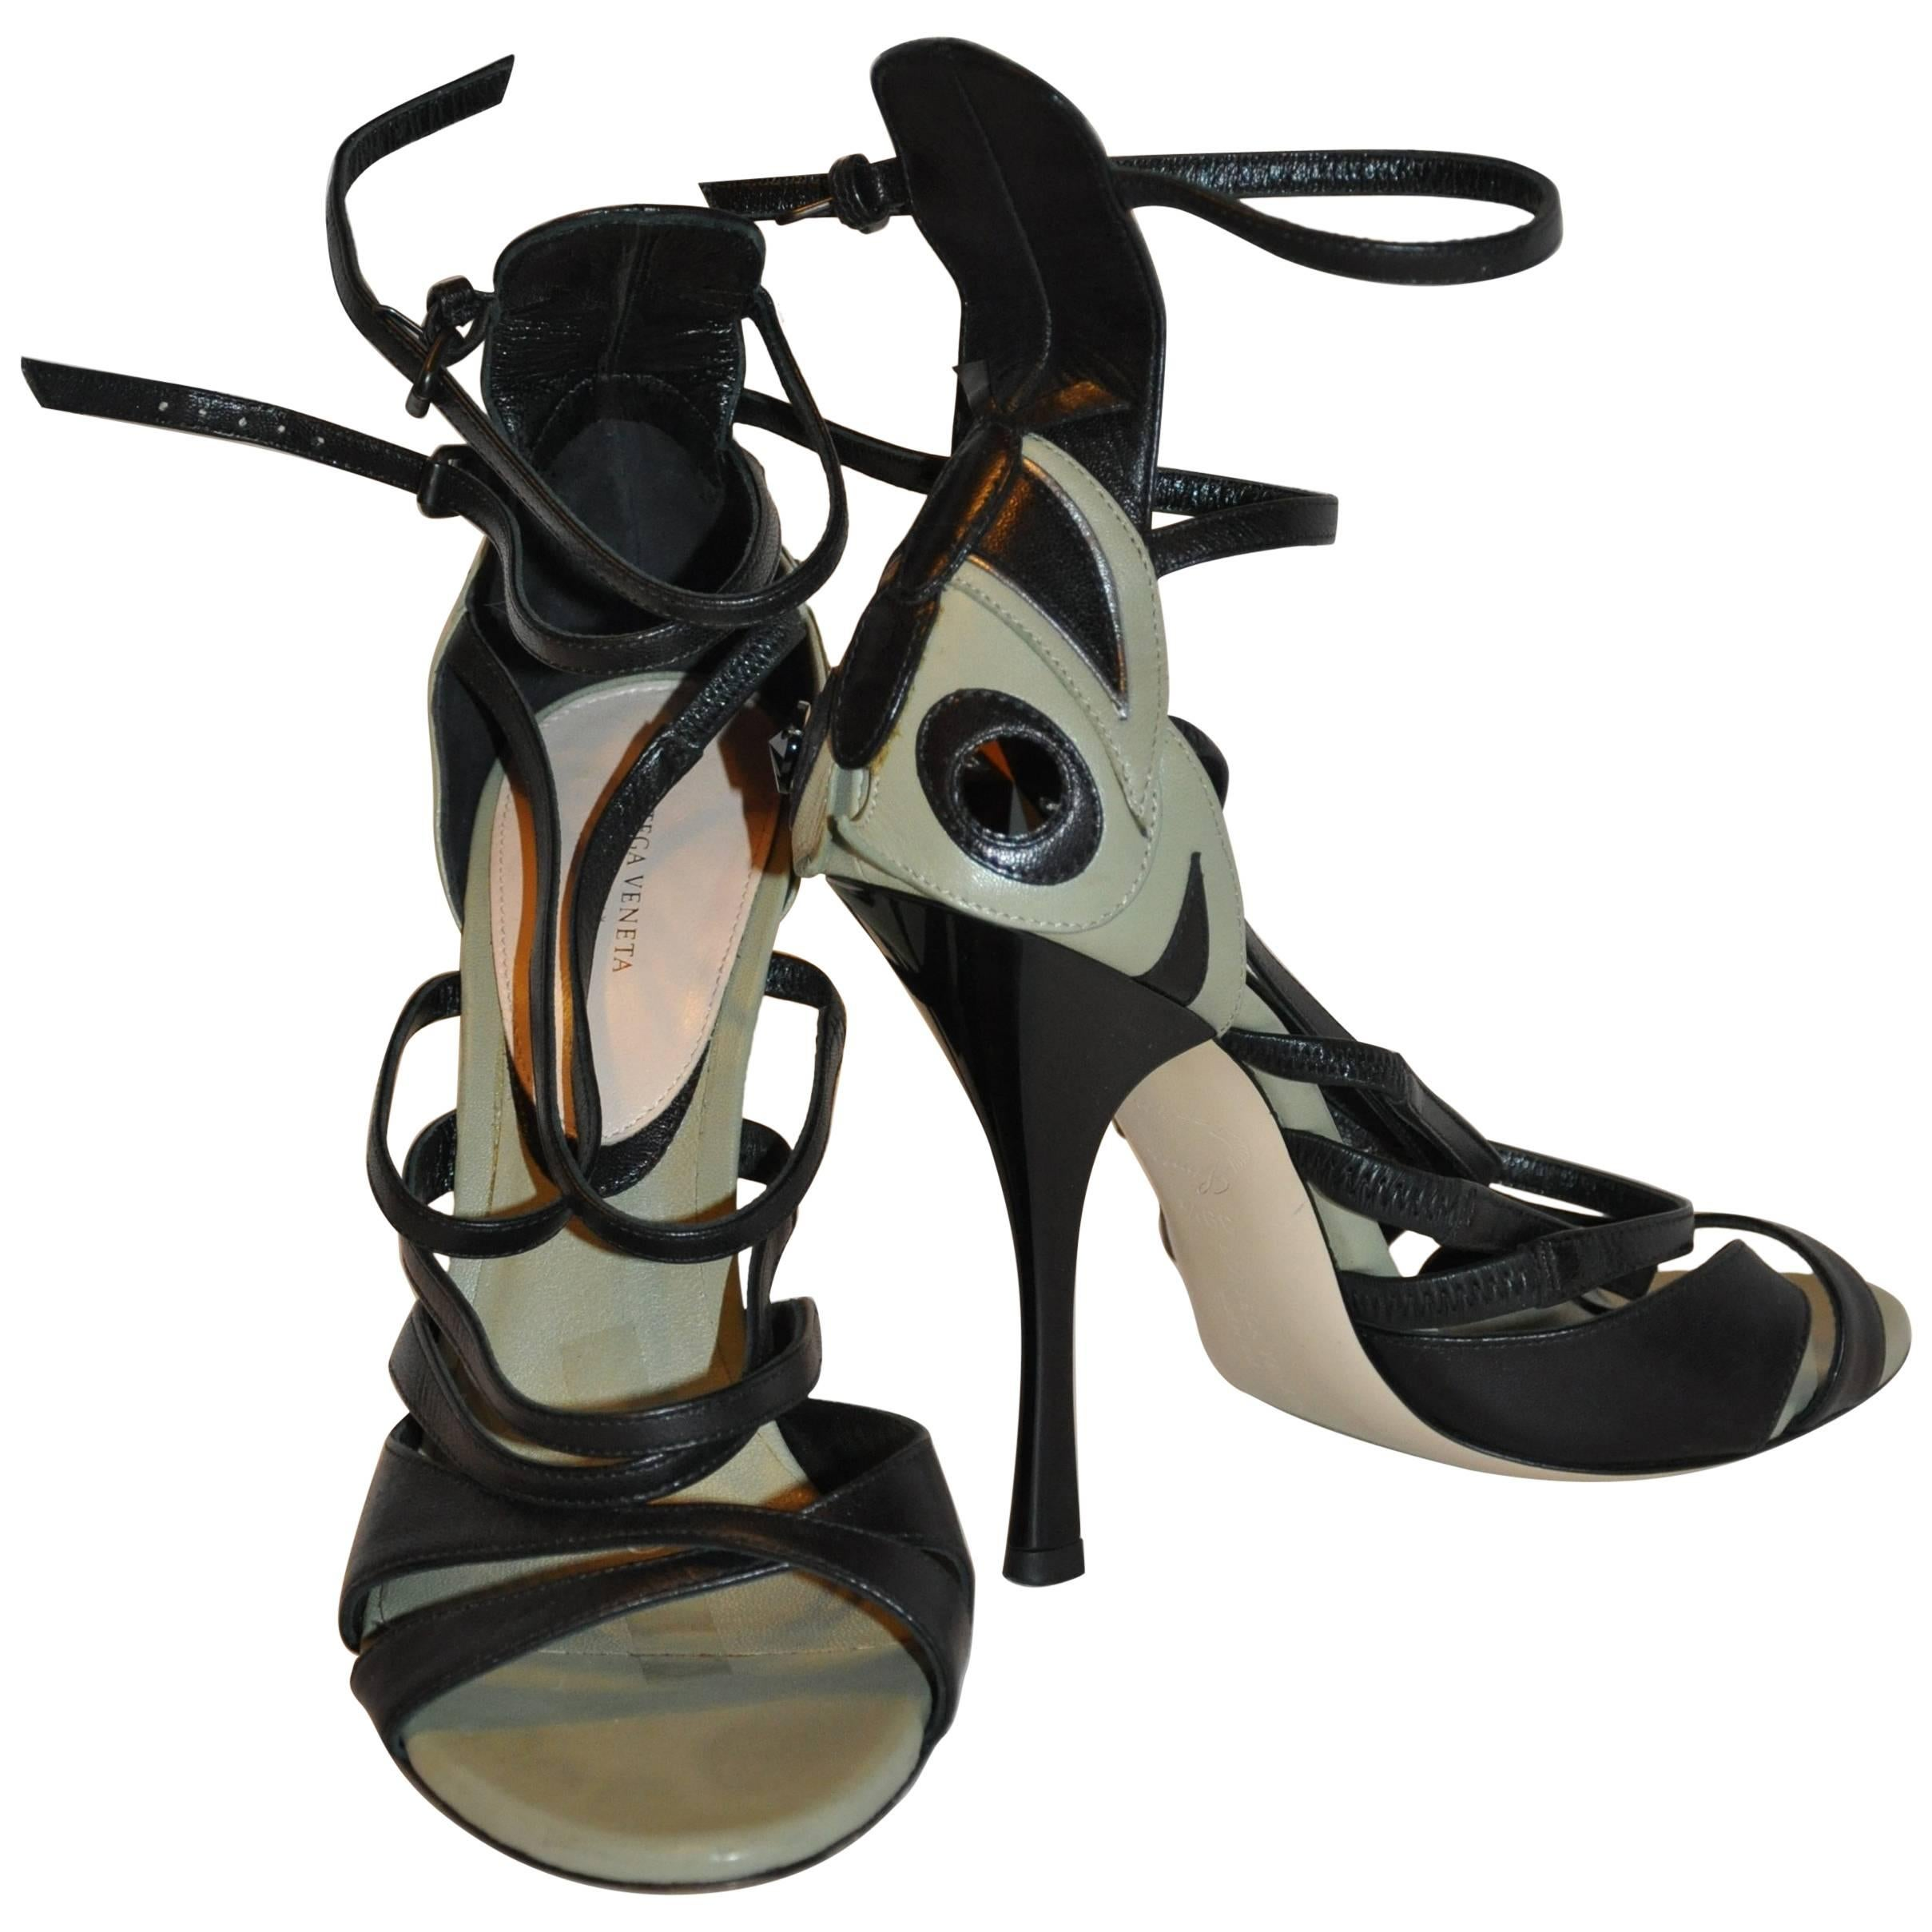 "Bottega Veneta ""Limited Edition"" Olive & Black Strappy Ankle Strap Heels"